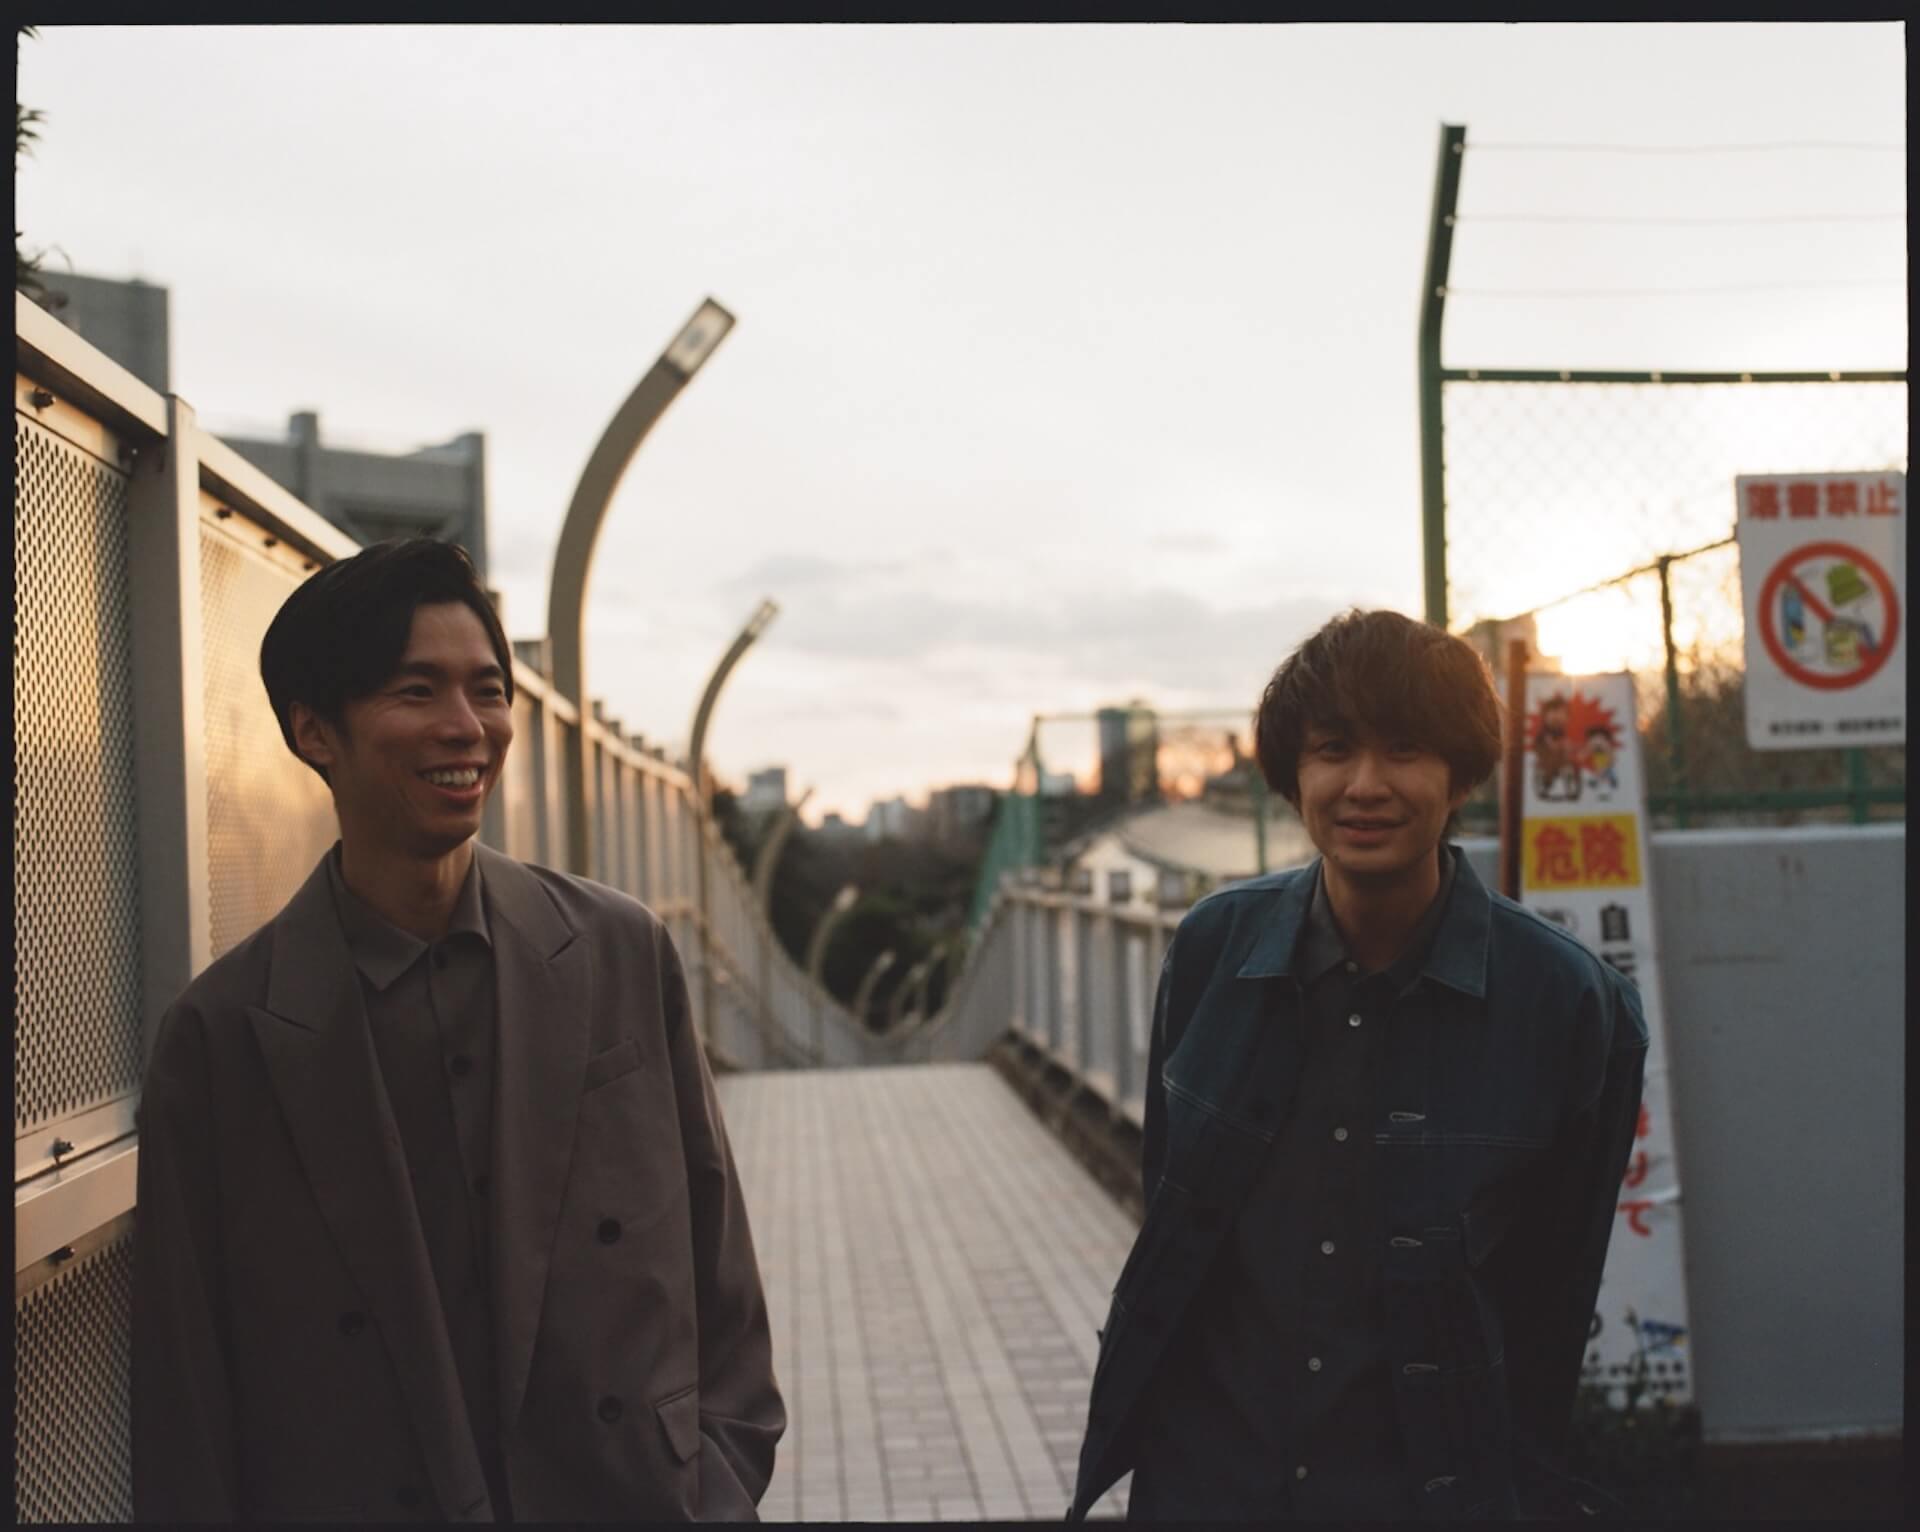 sunsite『Buenos!』──山本幹宗&永嶋柊吾による新バンドの「愛あるオマージュ」とまっすぐな姿勢 interview2105-sunsite-4